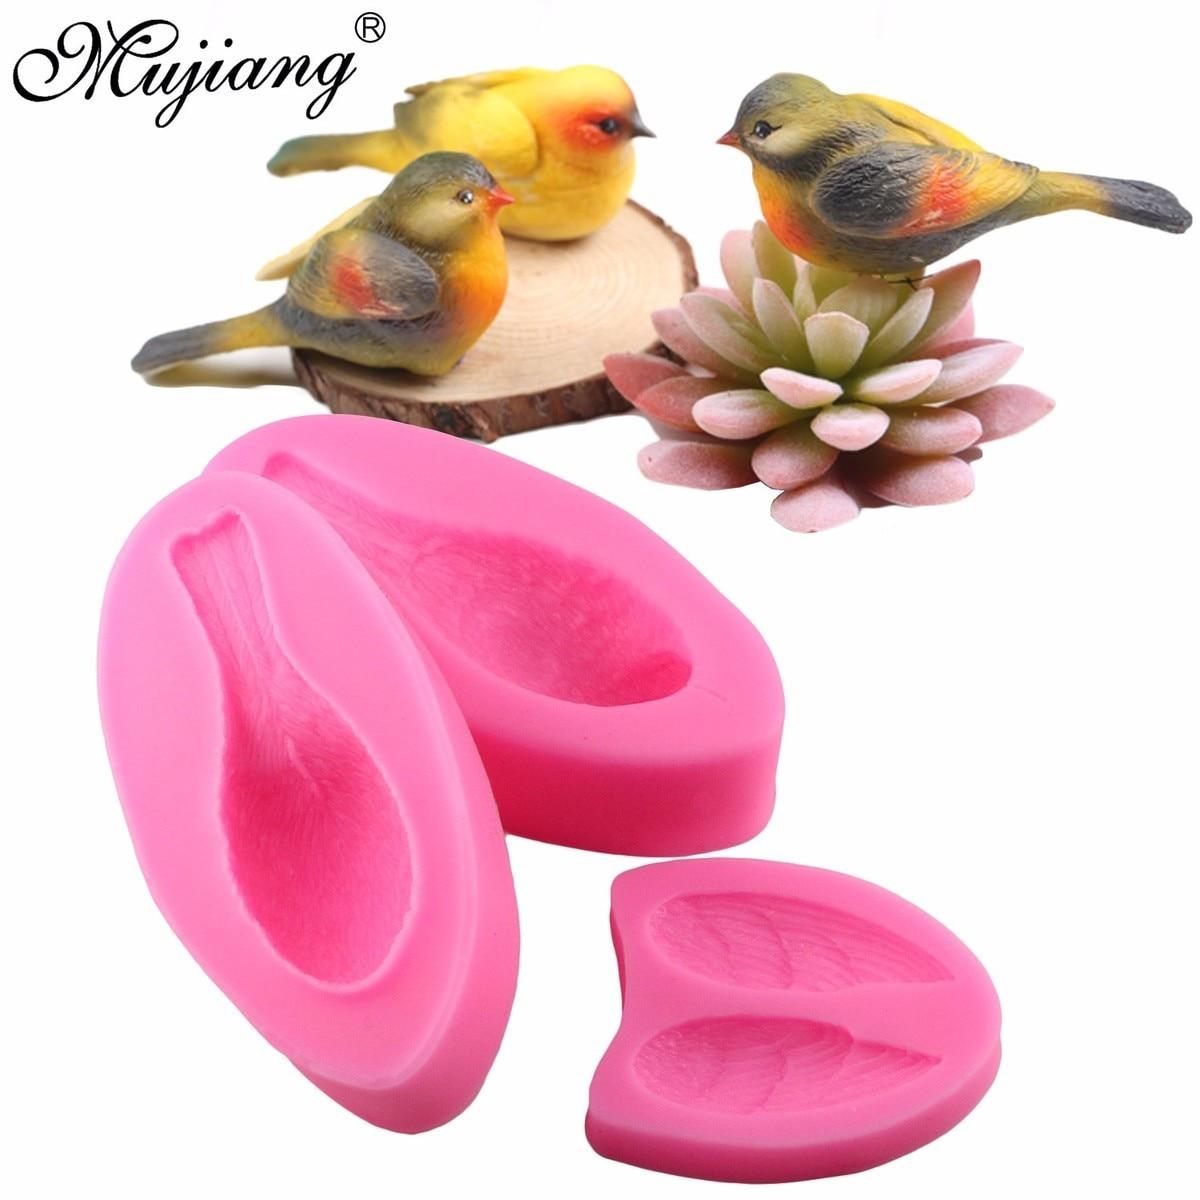 Mujiang cute 3d bird fondant cake decorating tools for Sugar craft decorations